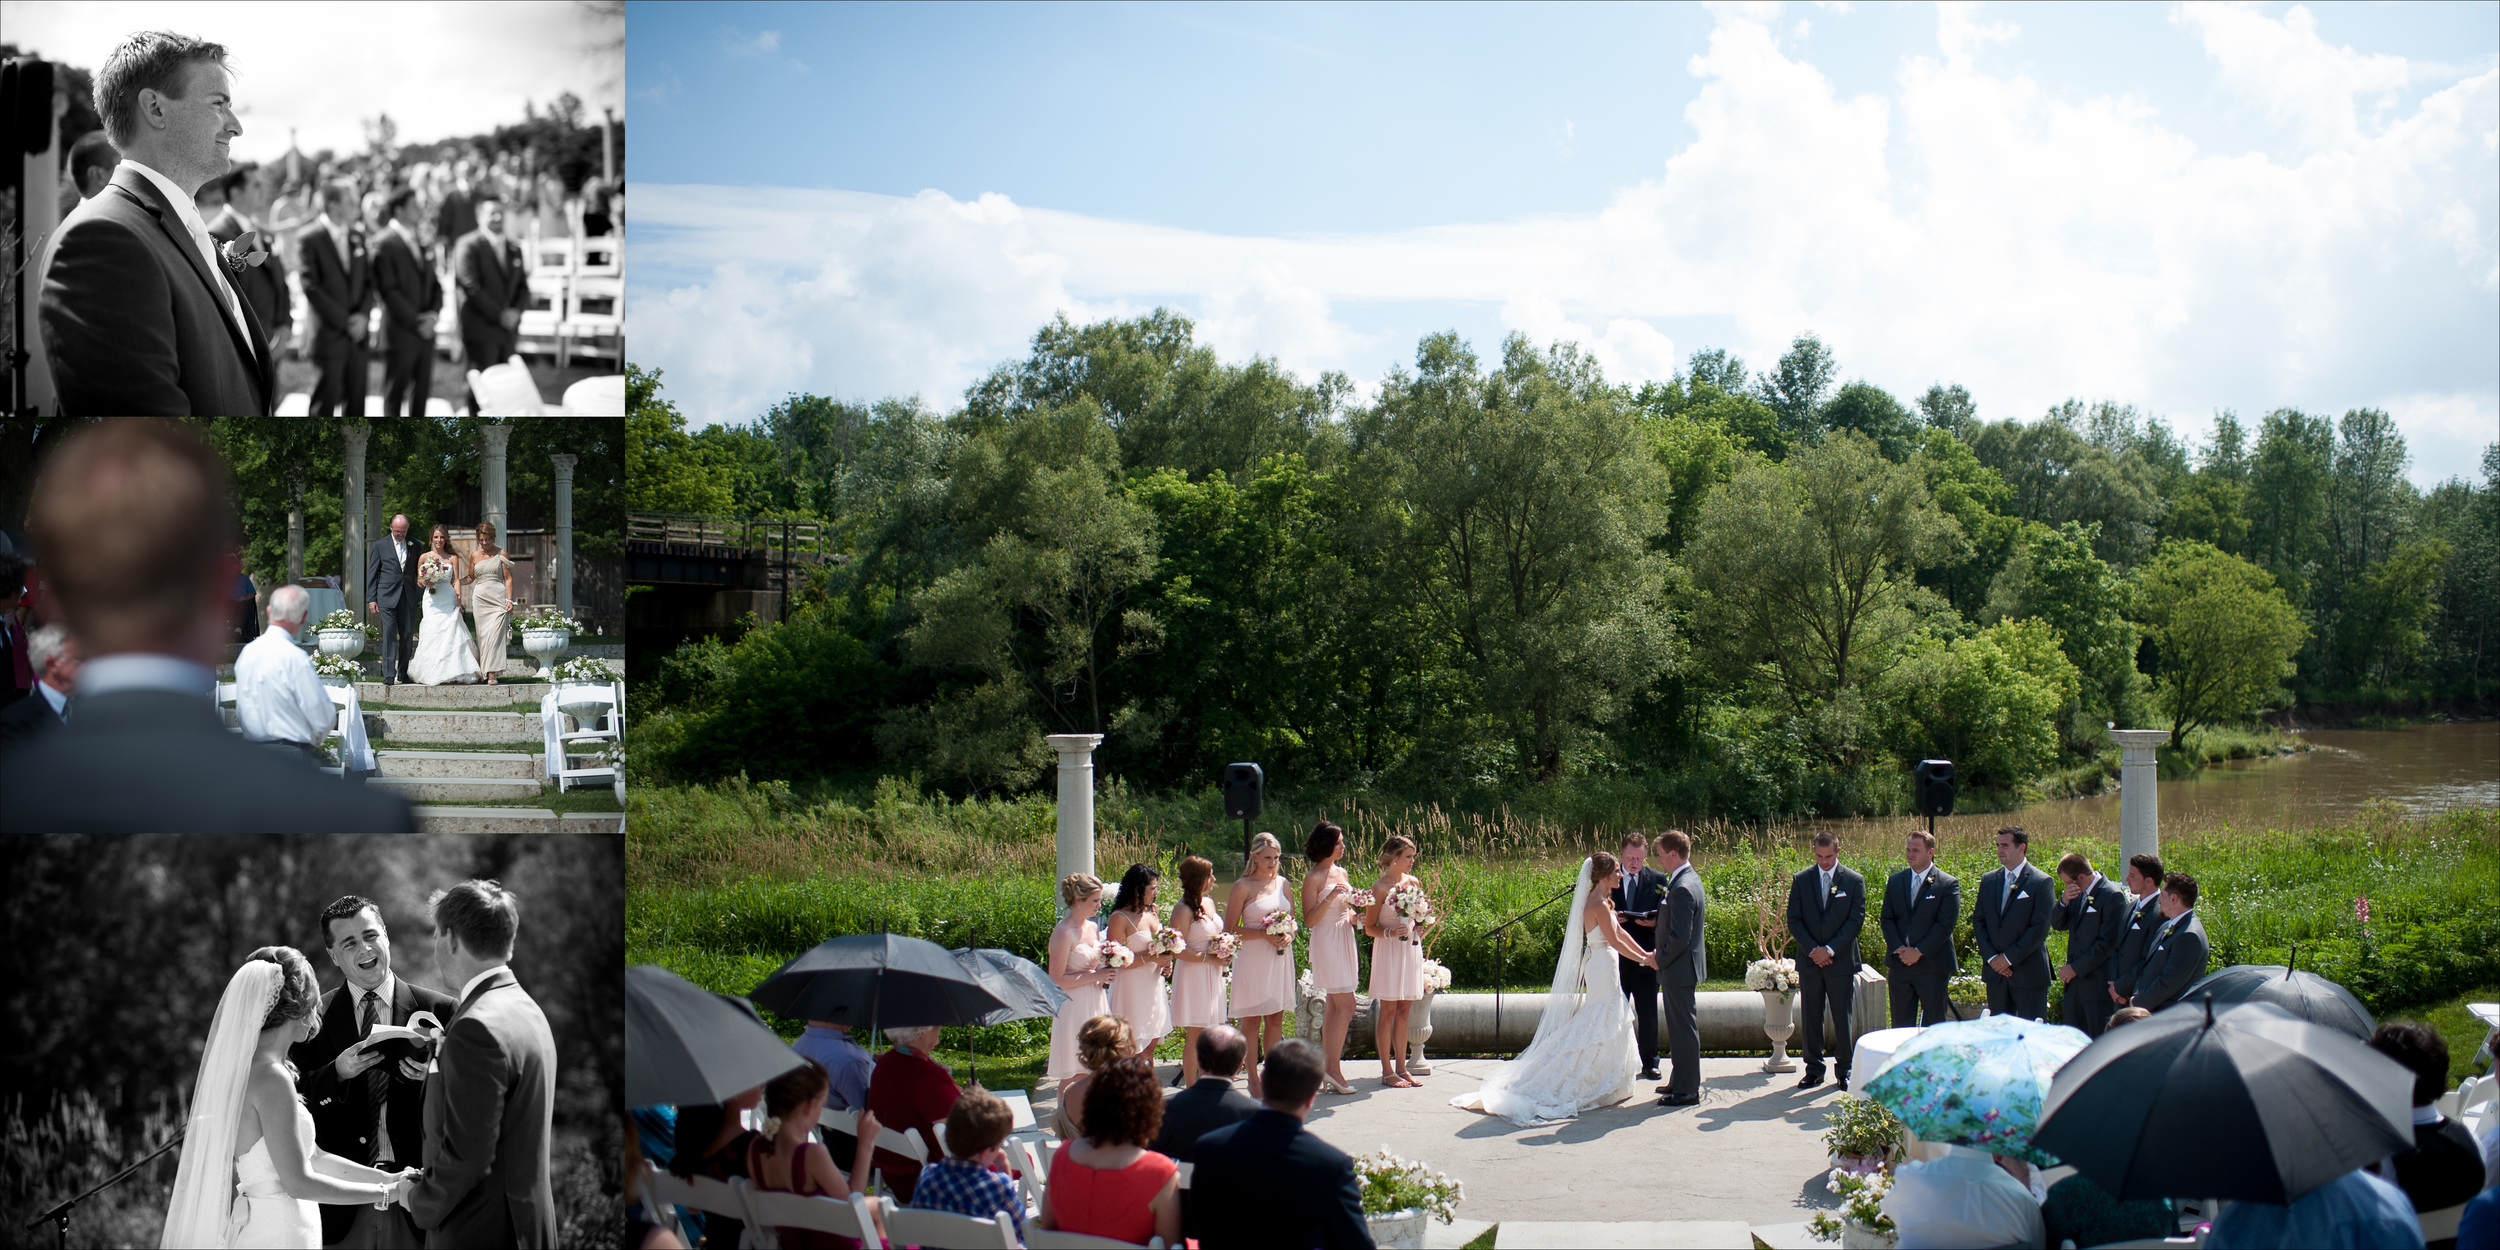 nith-ridge-wedding-album9.jpg